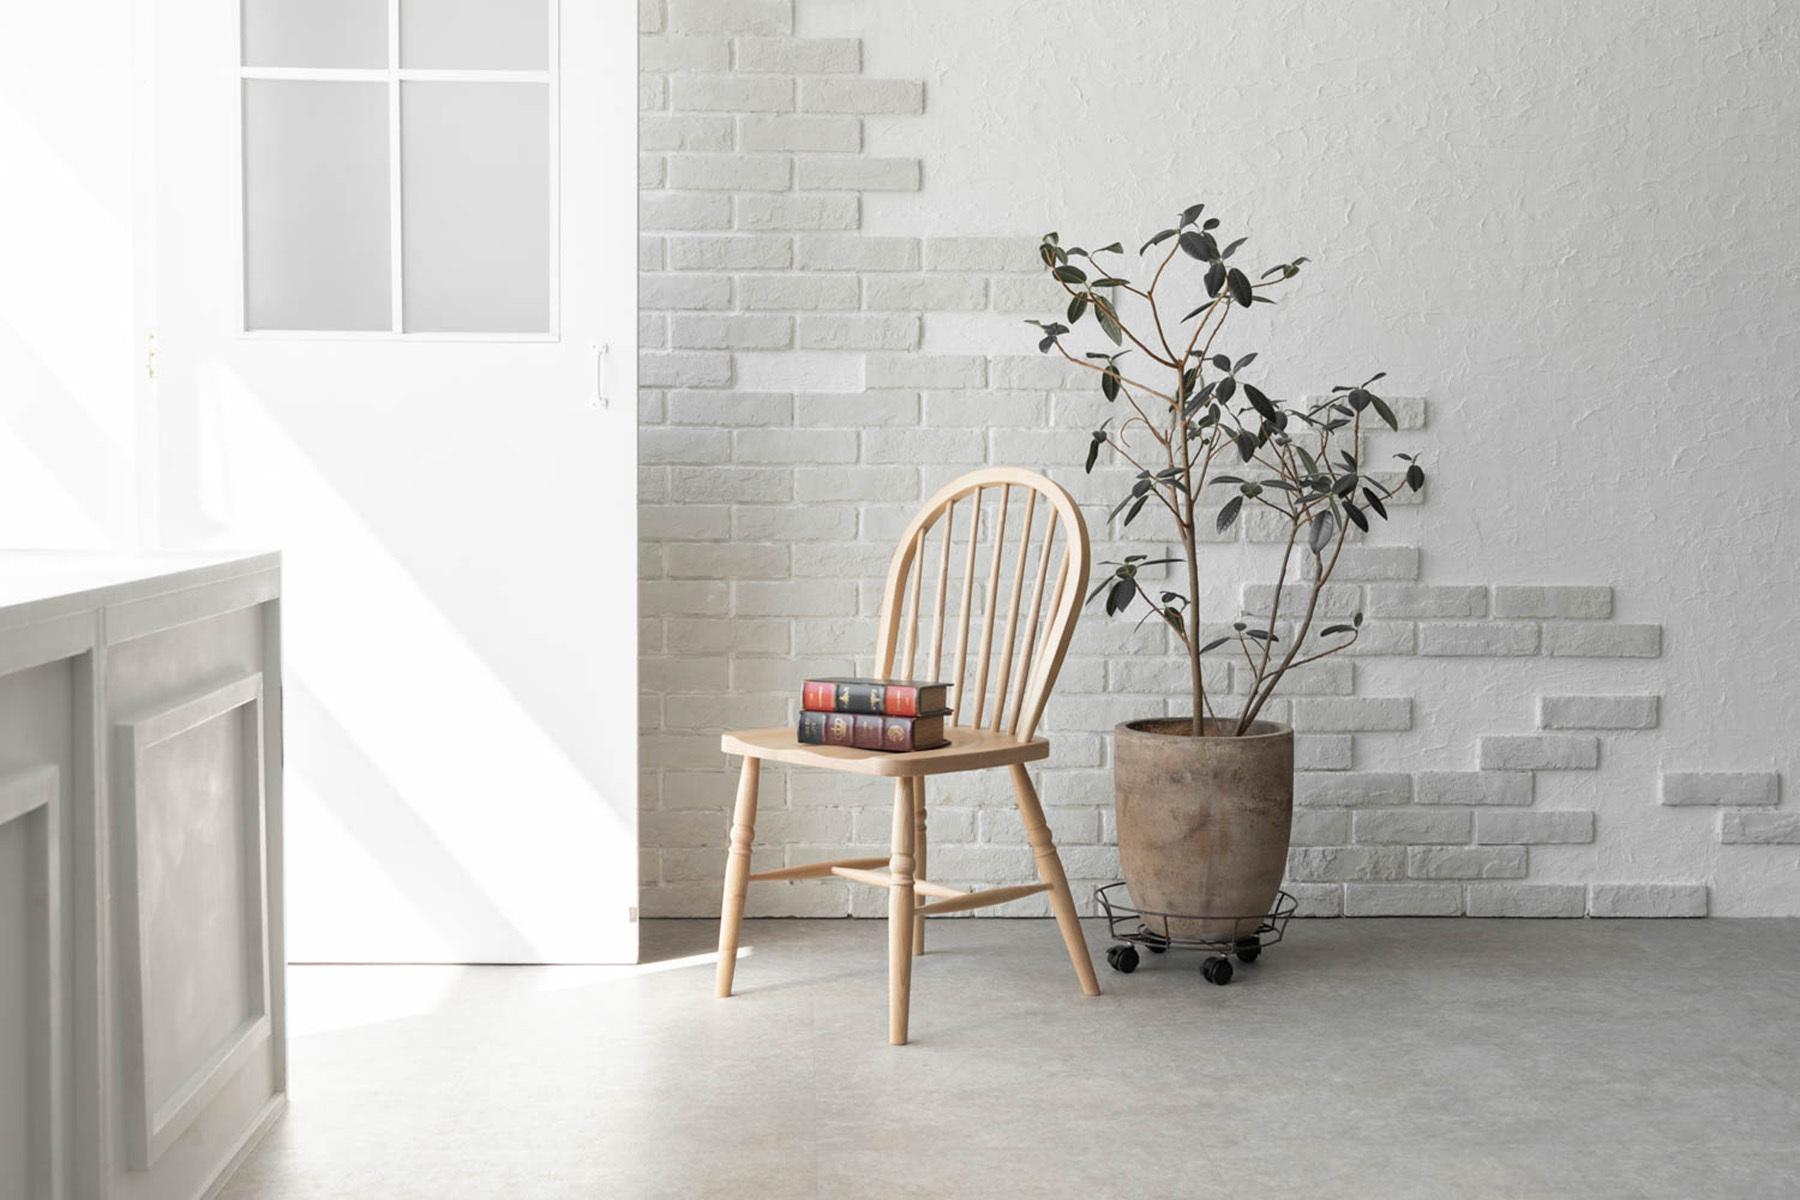 STUDIO TWOBEE  (スタジオ トゥービー)3m四方のマグネット仕様の黒板壁